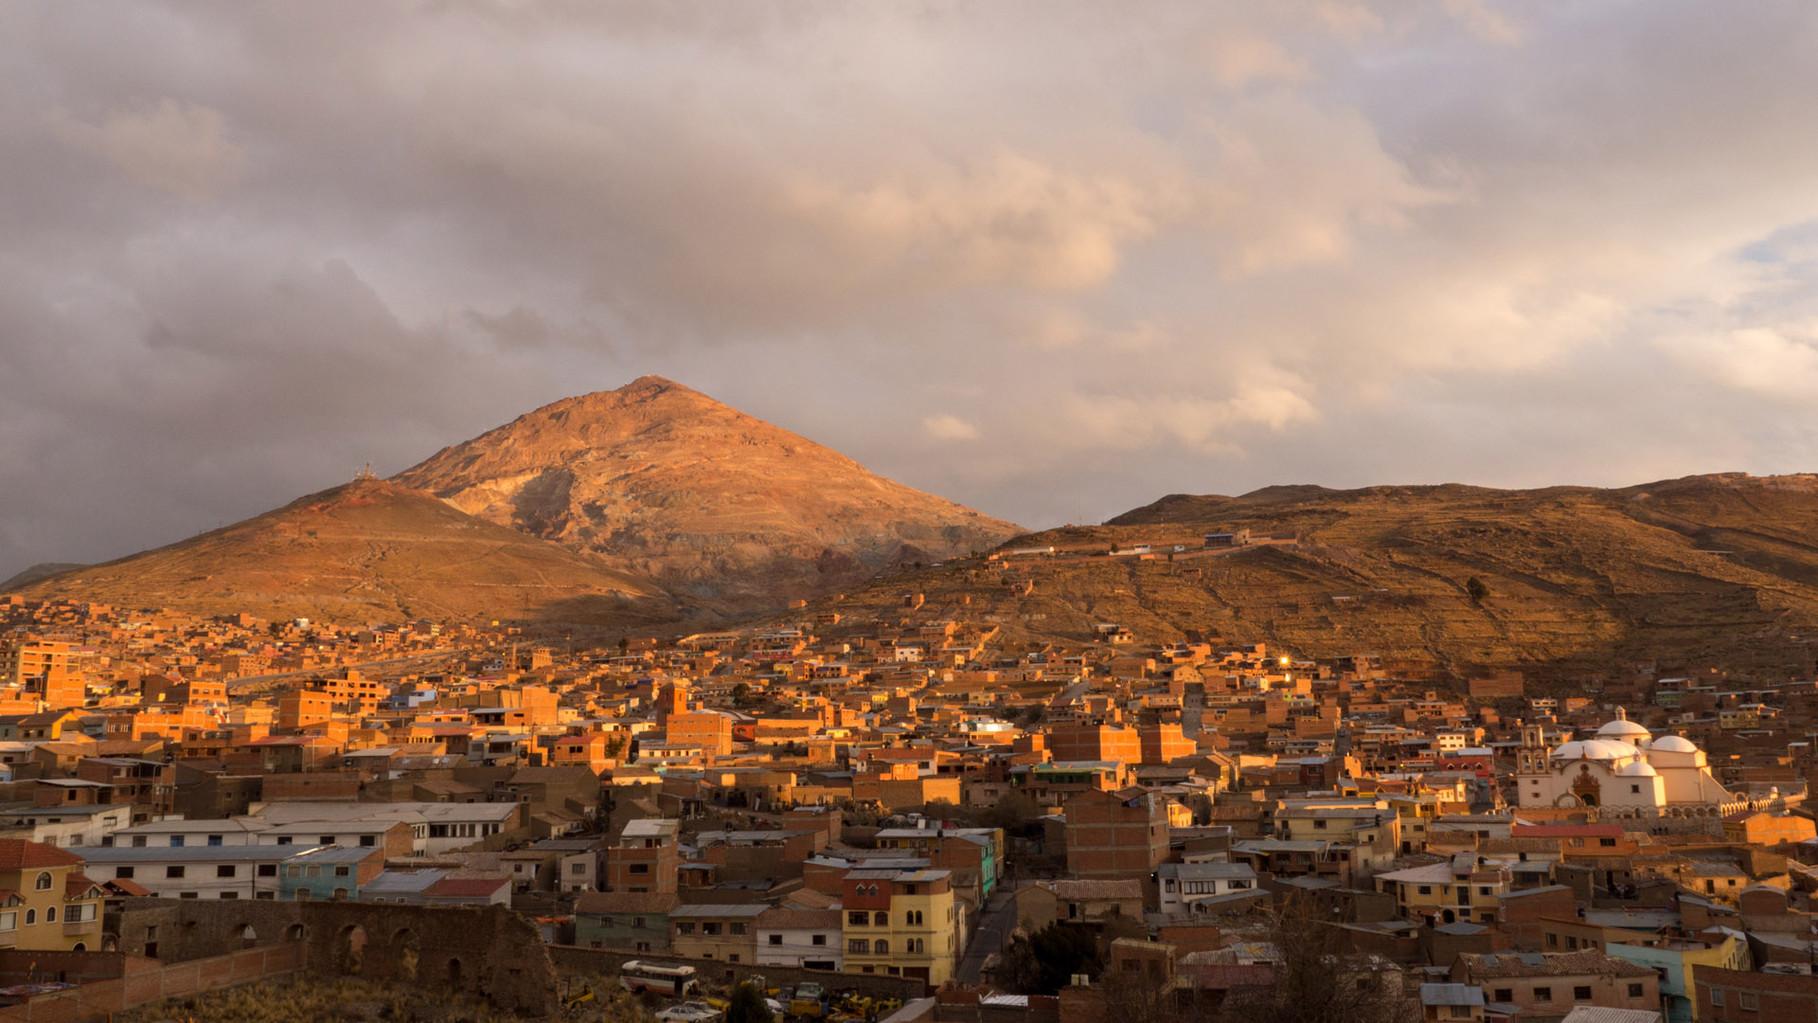 Potosi (4000 masl) with the mineral-rich Cerro Rico in the background